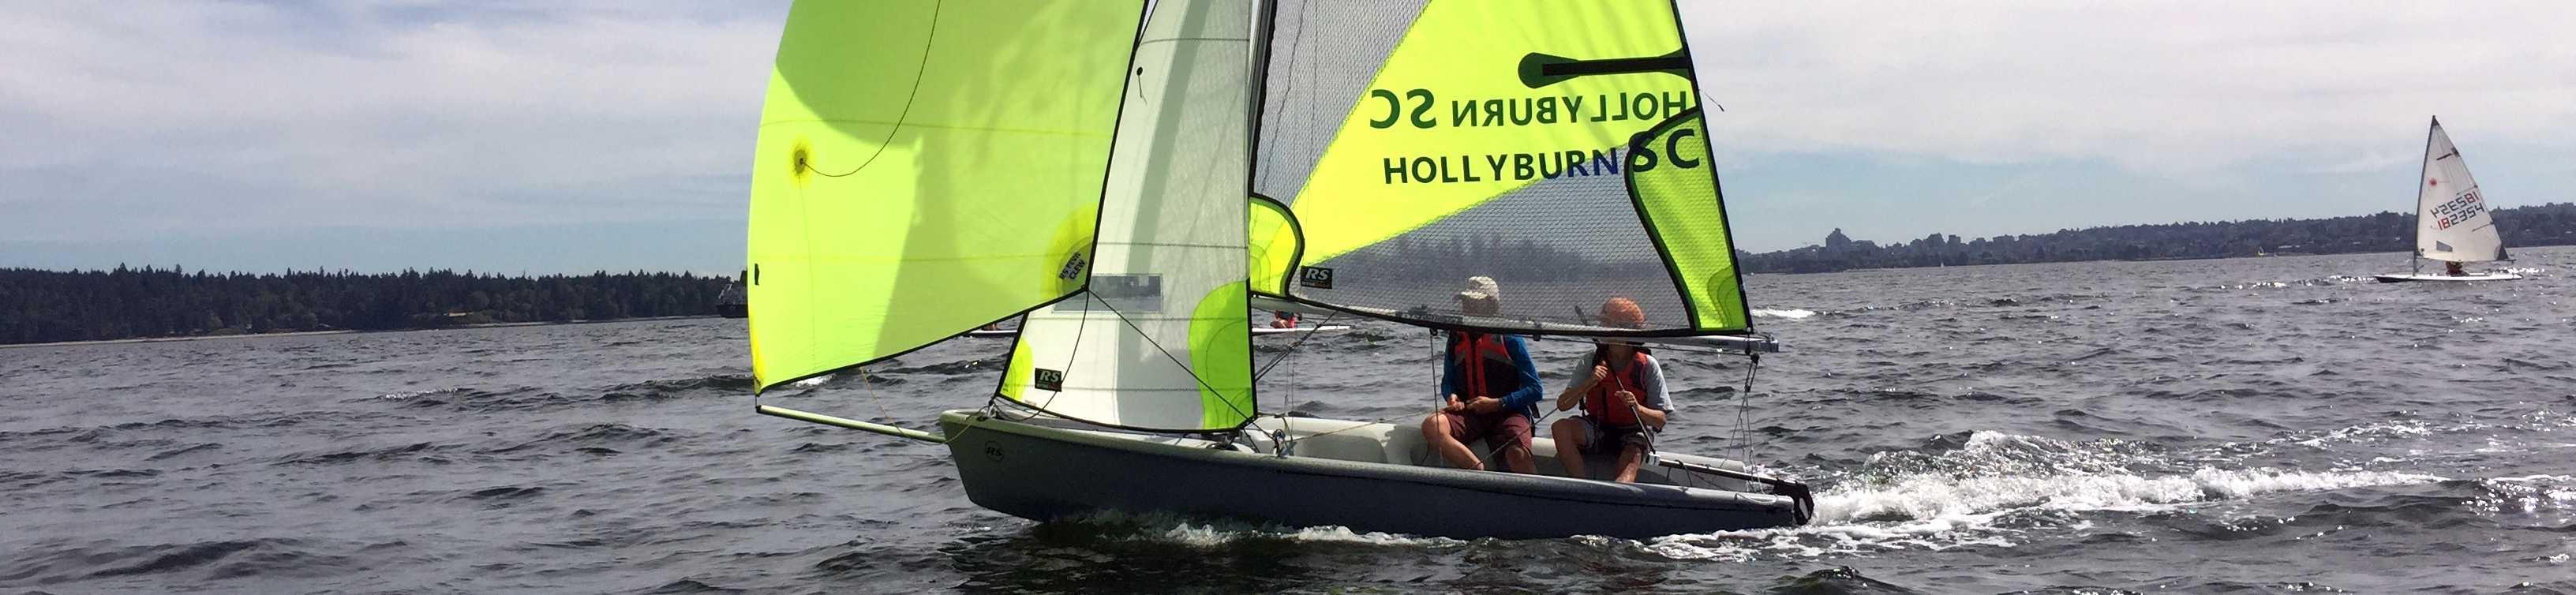 hollyburn-sailing-club-banner.jpg